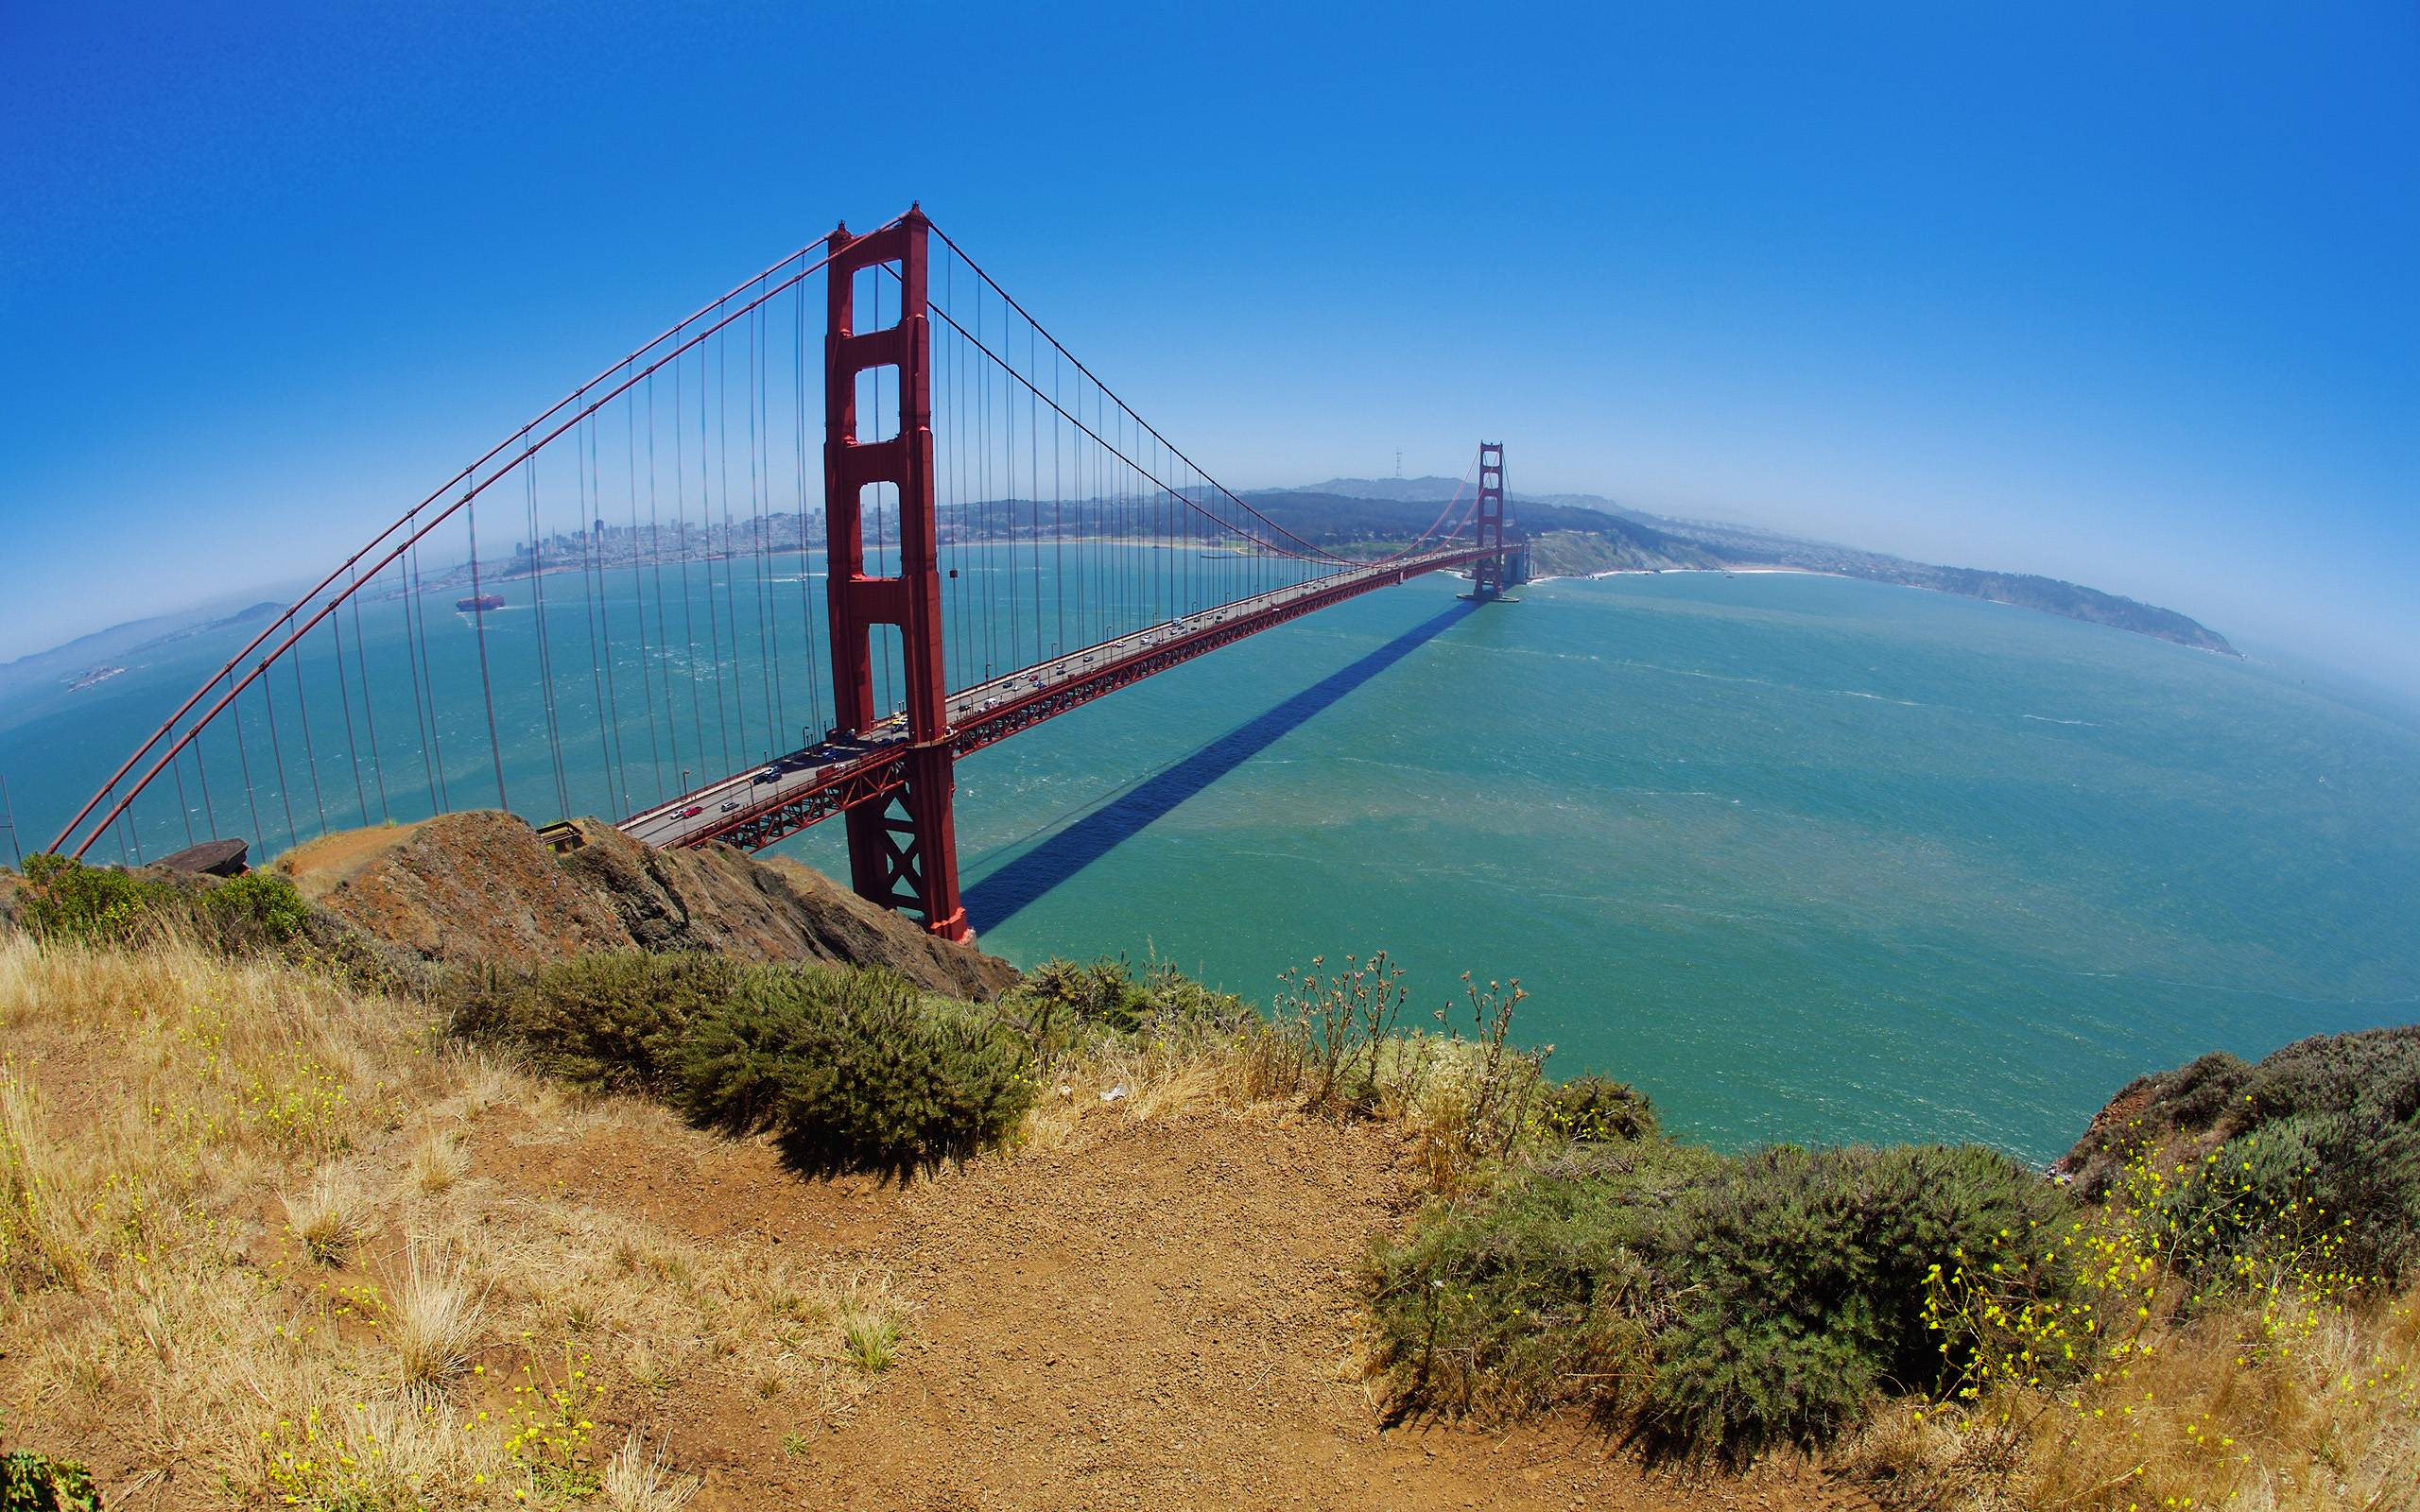 San Francisco beautiful wallpapers hd - Socialphy